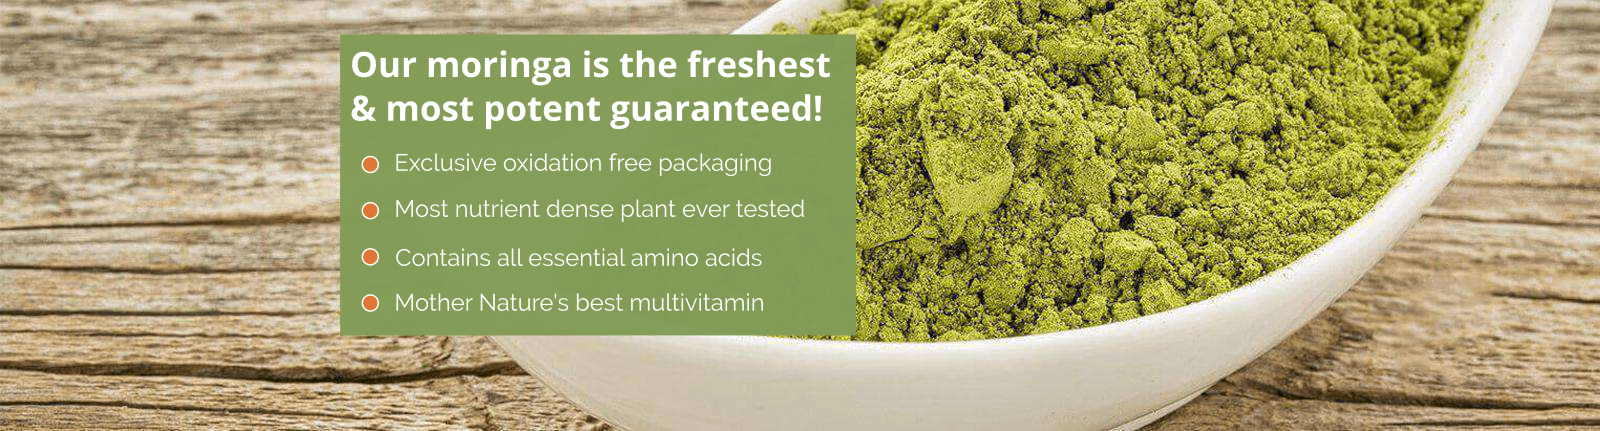 Green Virgin Moringa Products